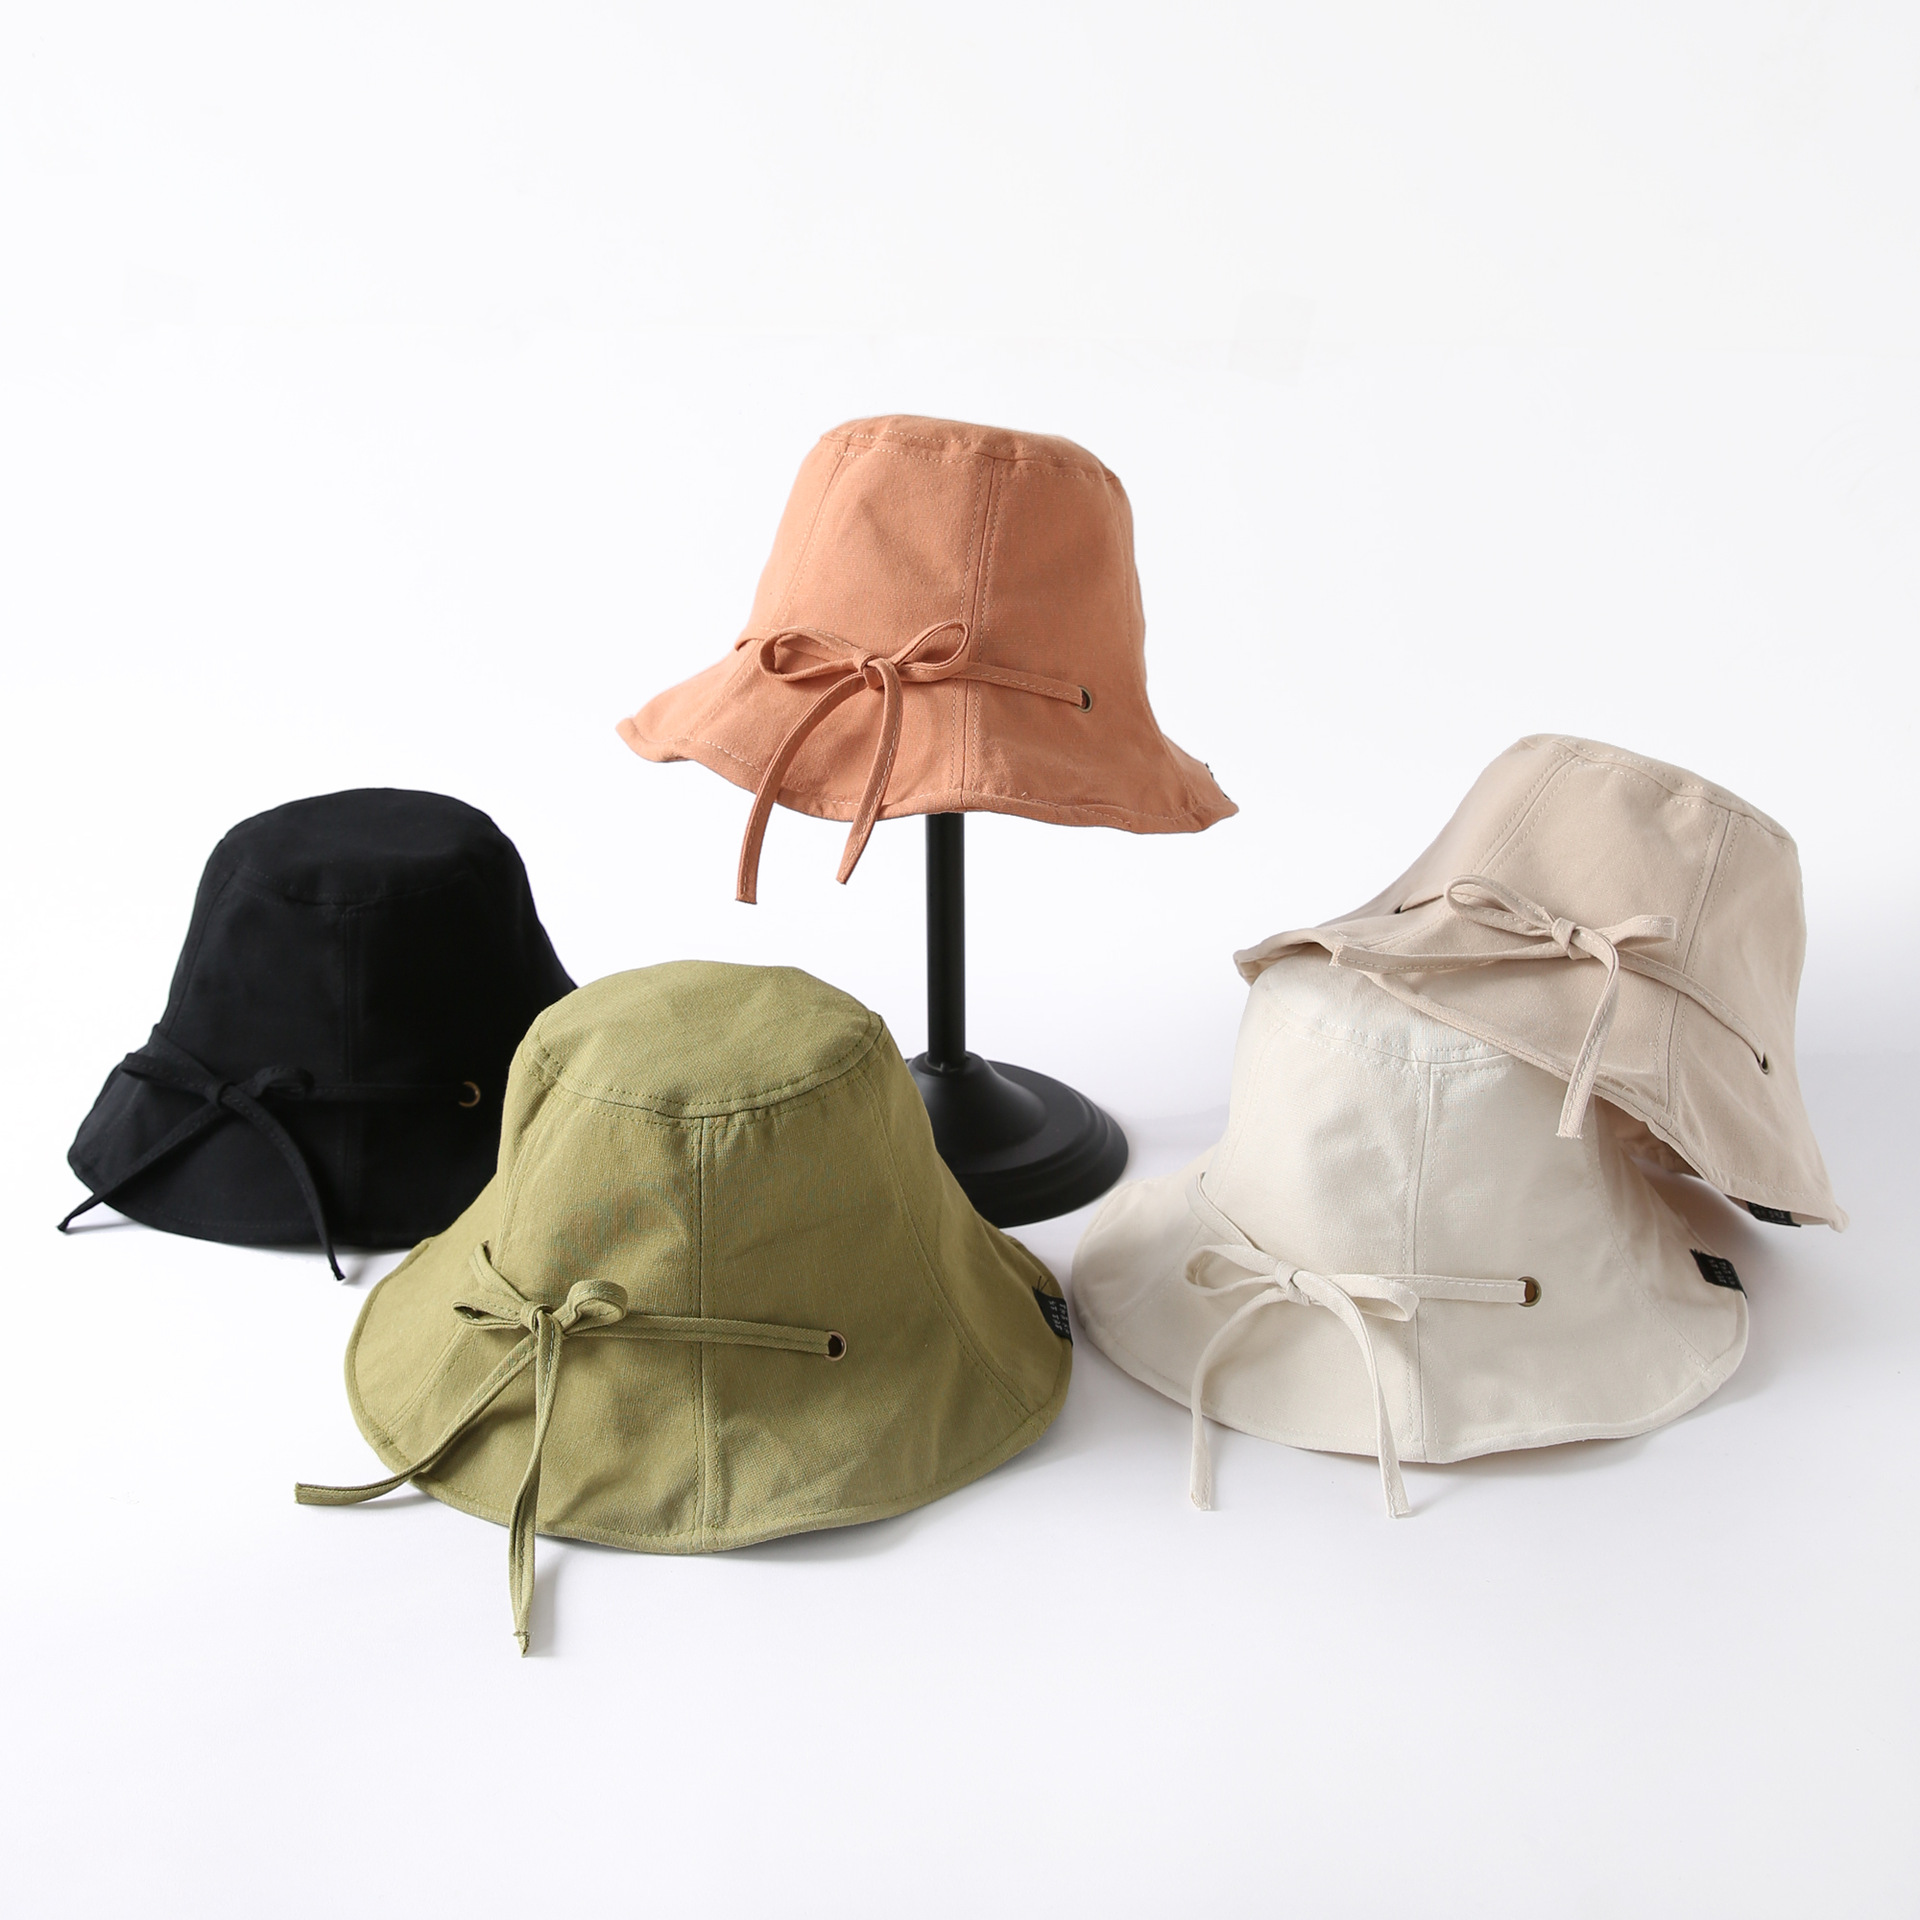 Franch Style Elegant Bucket Hat Women Fashion Summer Beach Sun Outdoors Fisherman Bucket Hat Panama For 90's Girls